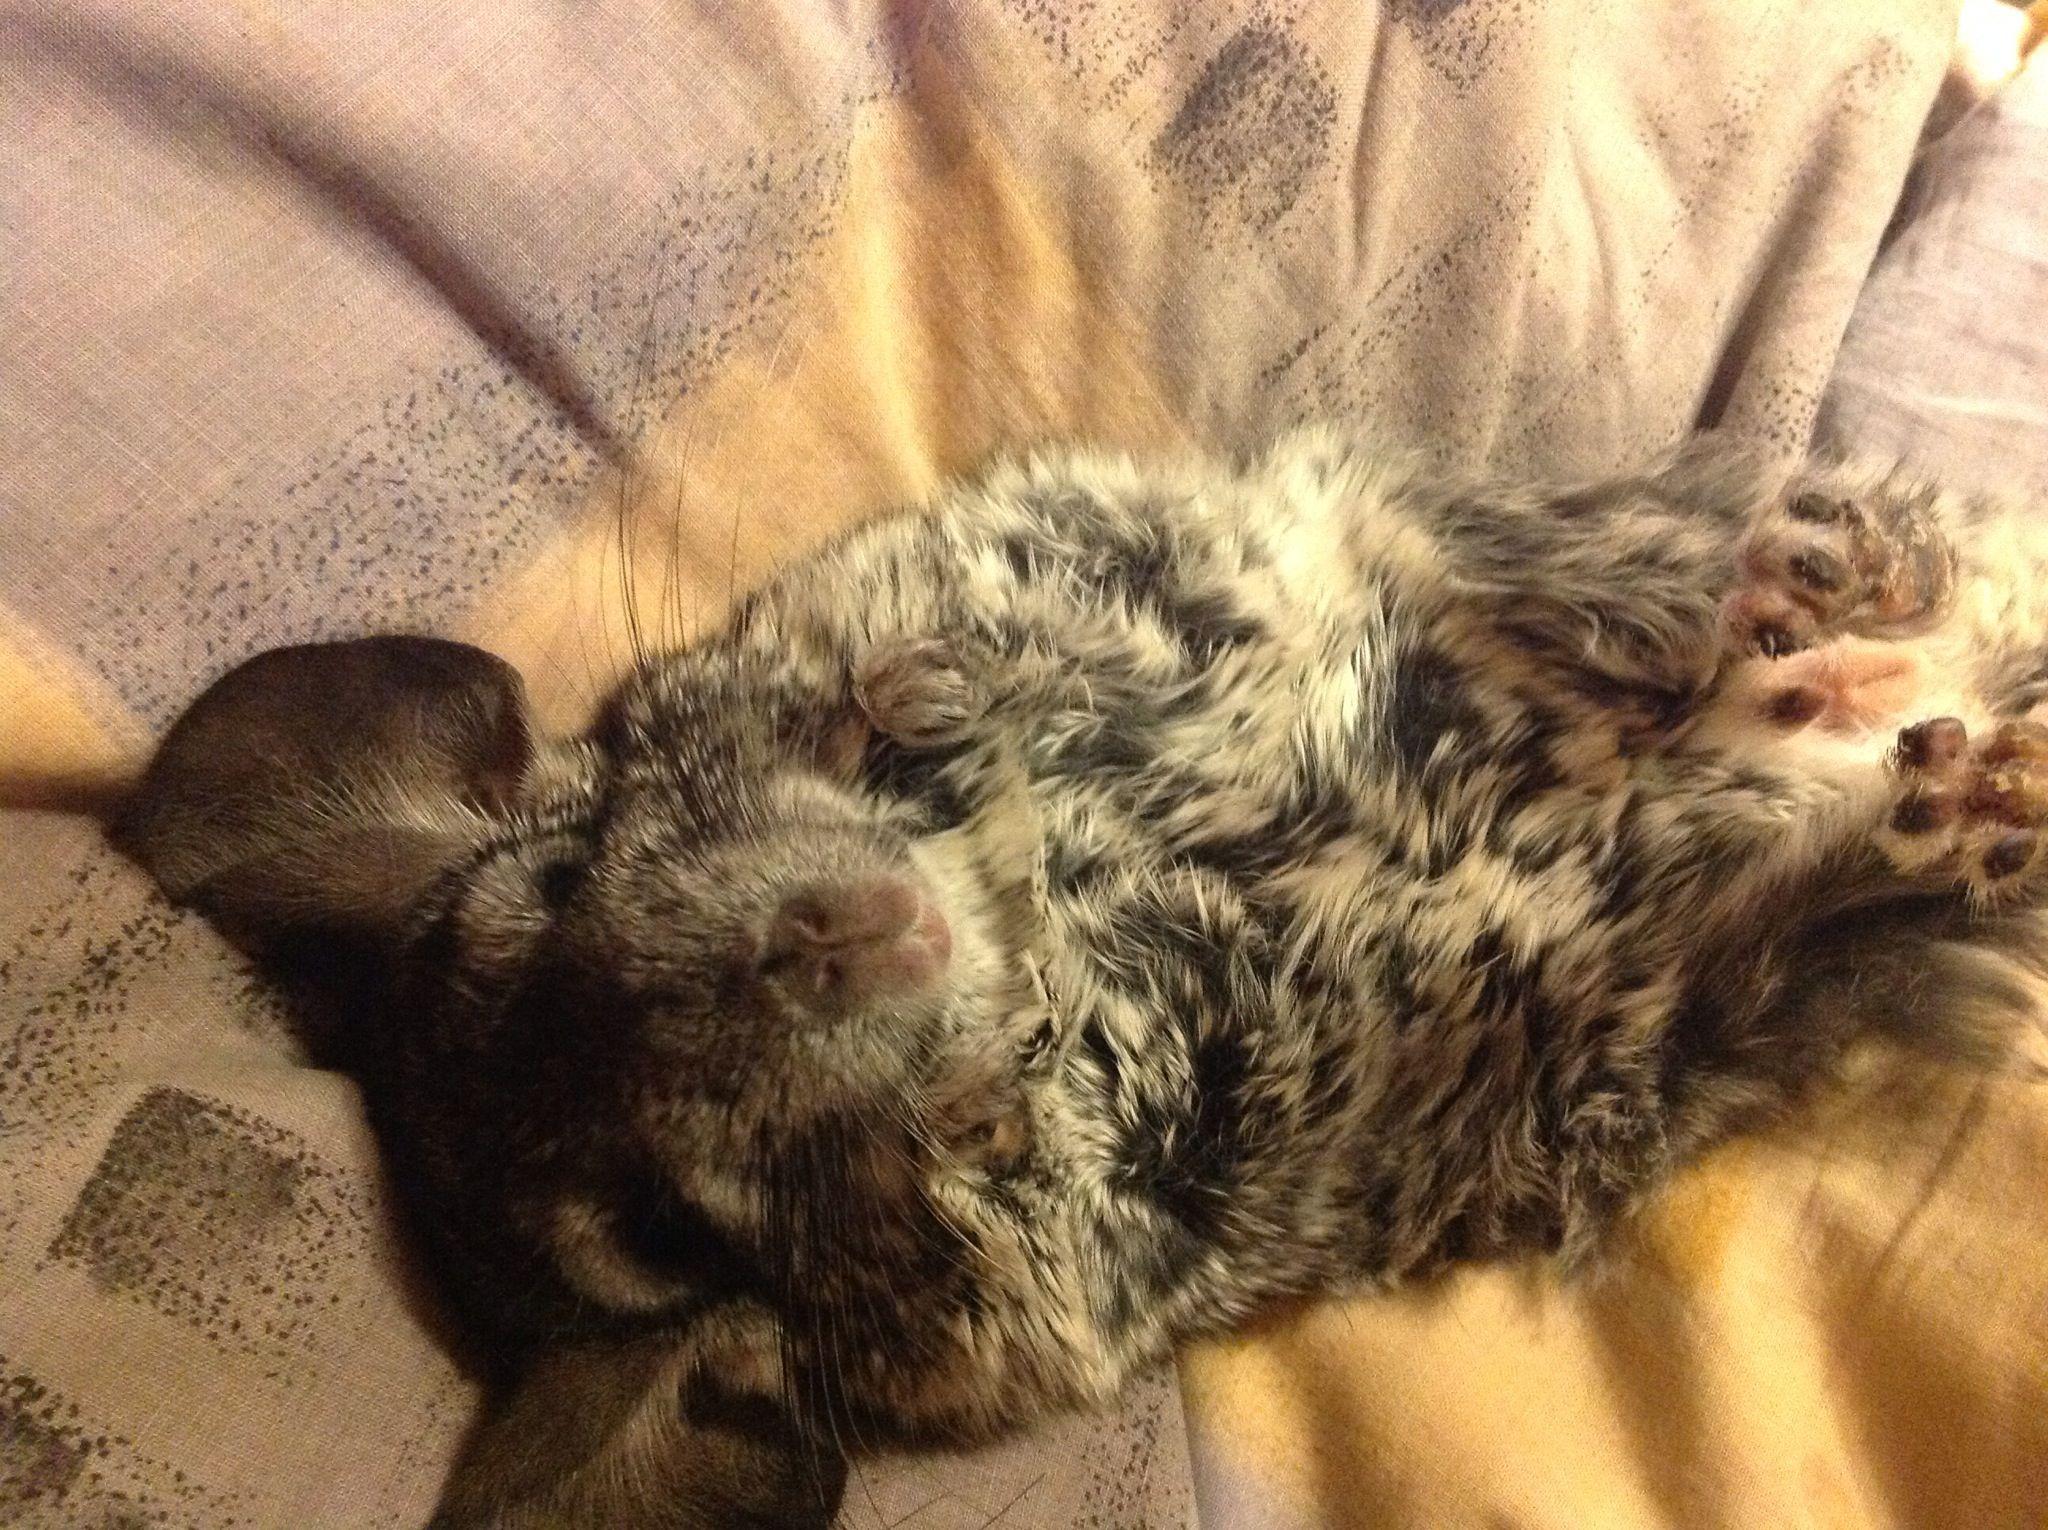 #chinchilla #chinchillas #szynszyla #relax #hobby #animals